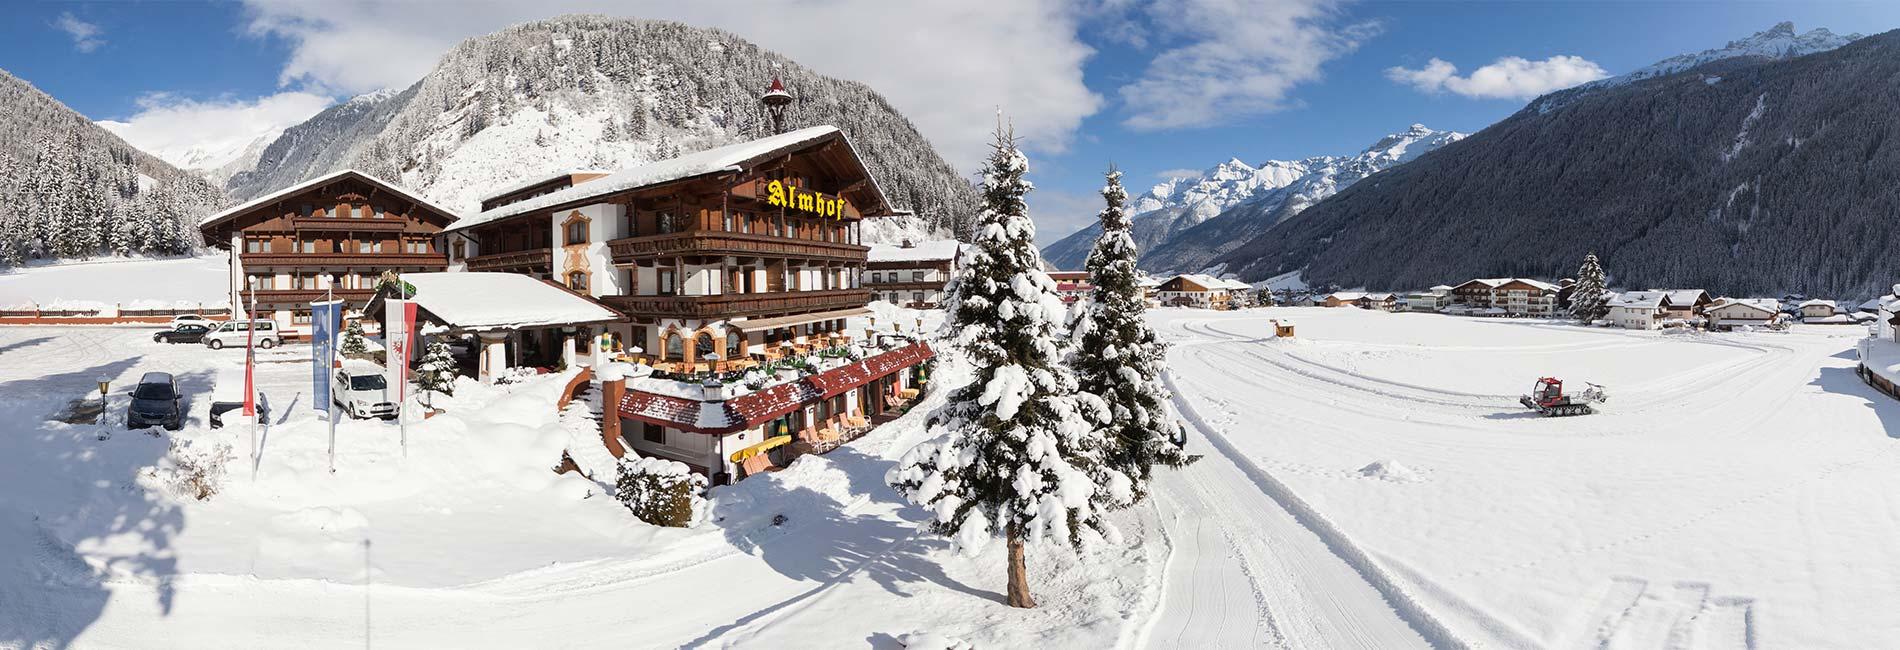 Hotel Almhof Neustift im Stubaital Urlaub in Tirol